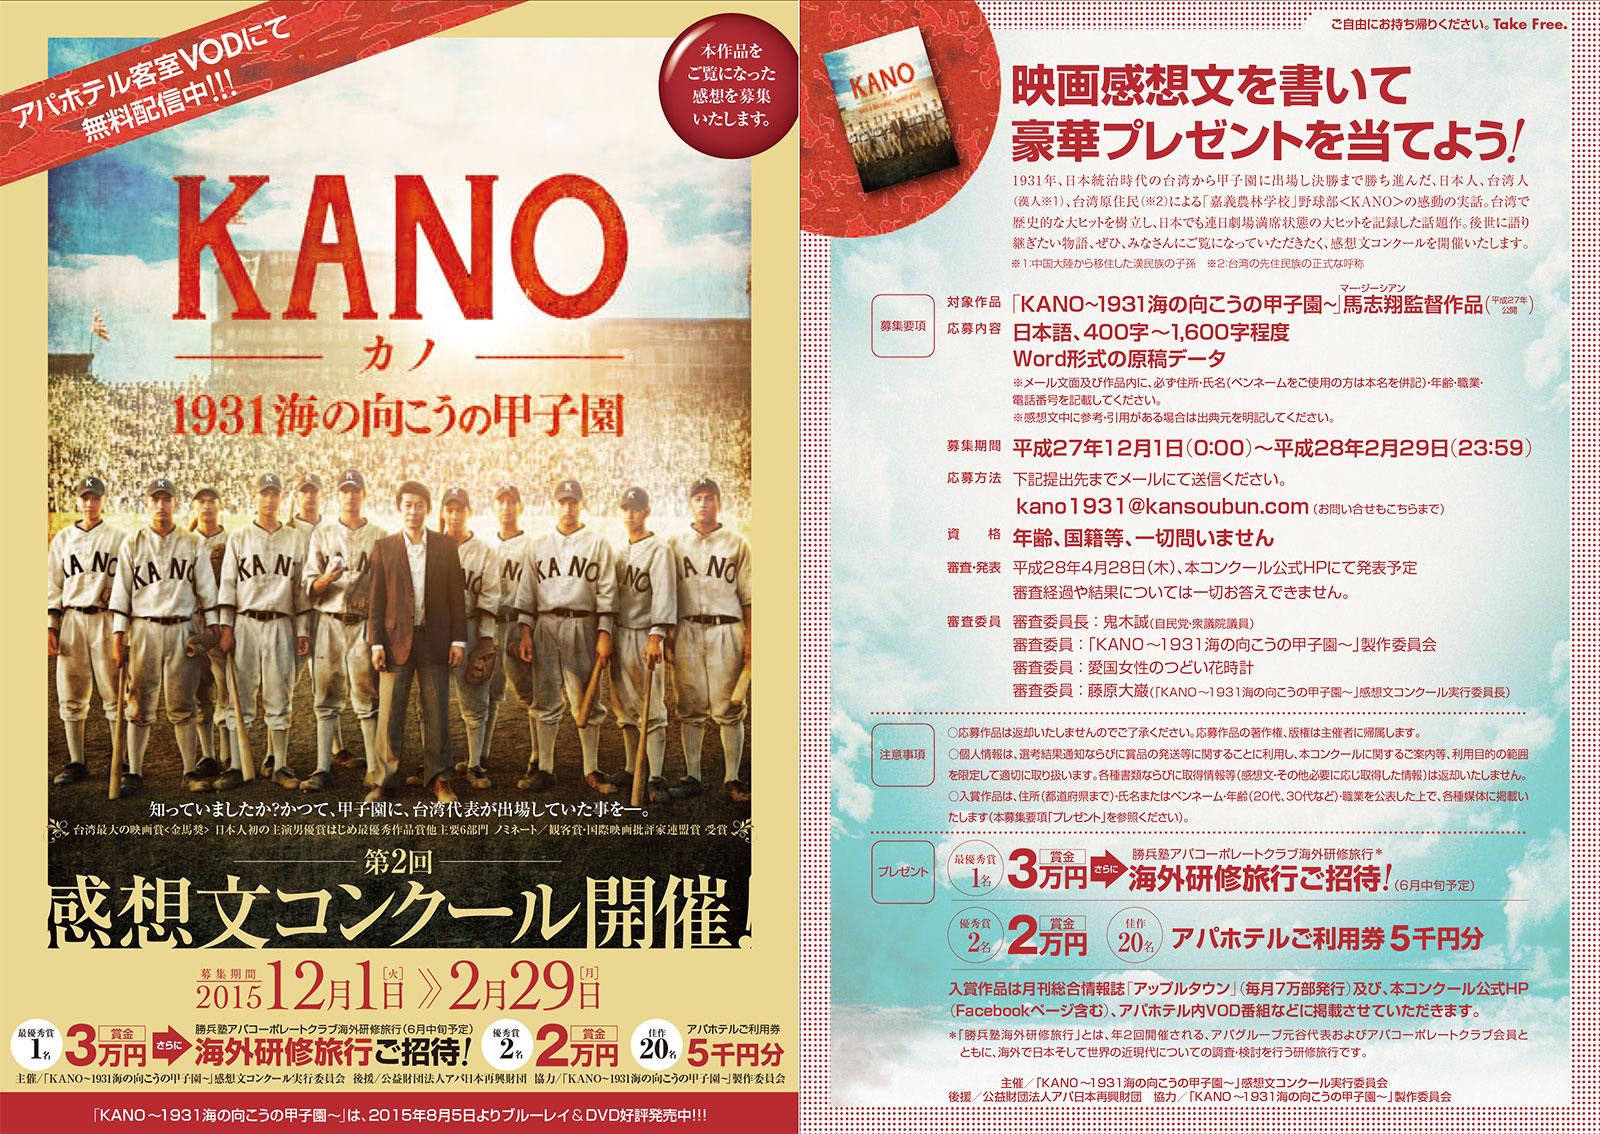 http://www.hanadokei2010.com/images/kano_kansobun.jpg